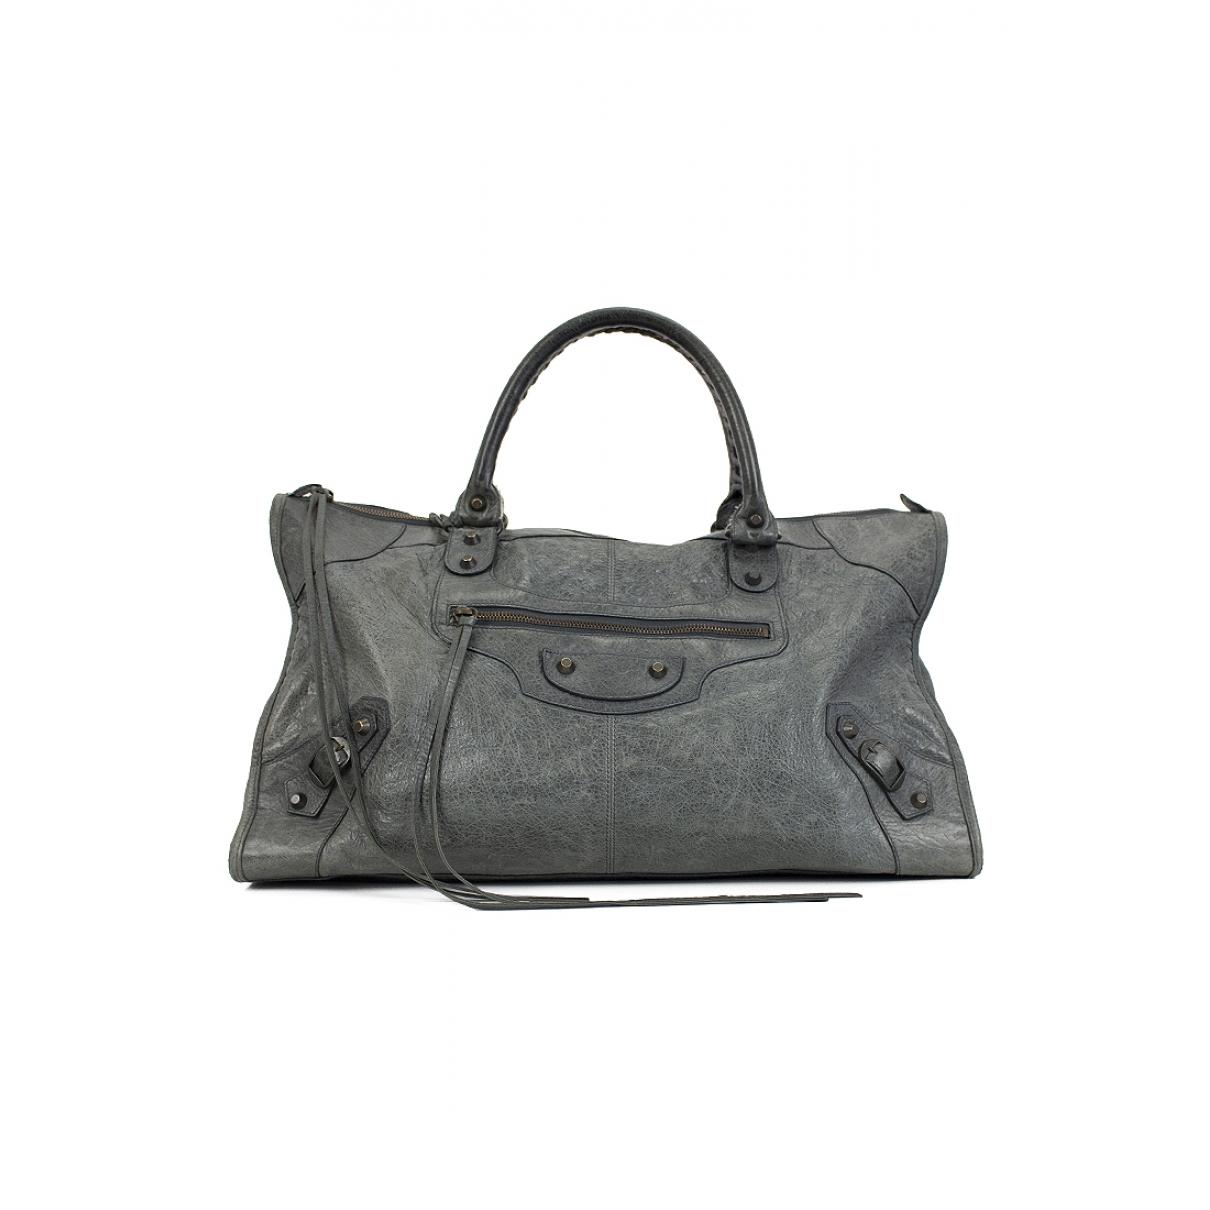 Balenciaga Work Handtasche in  Grau Leder